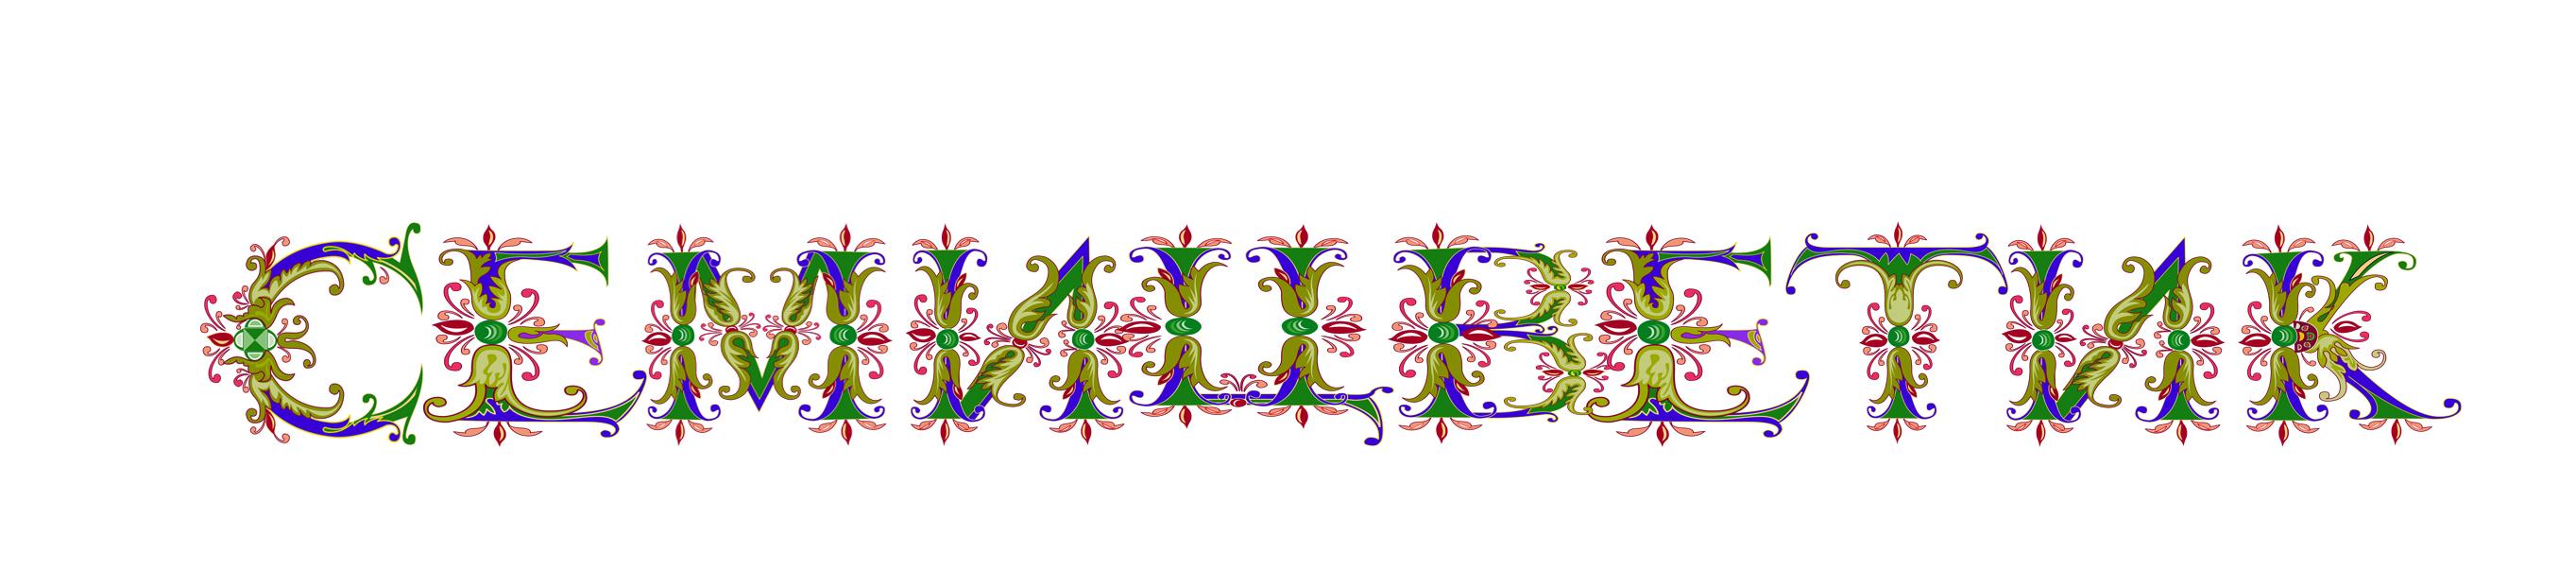 hello_html_m4c905097.jpg